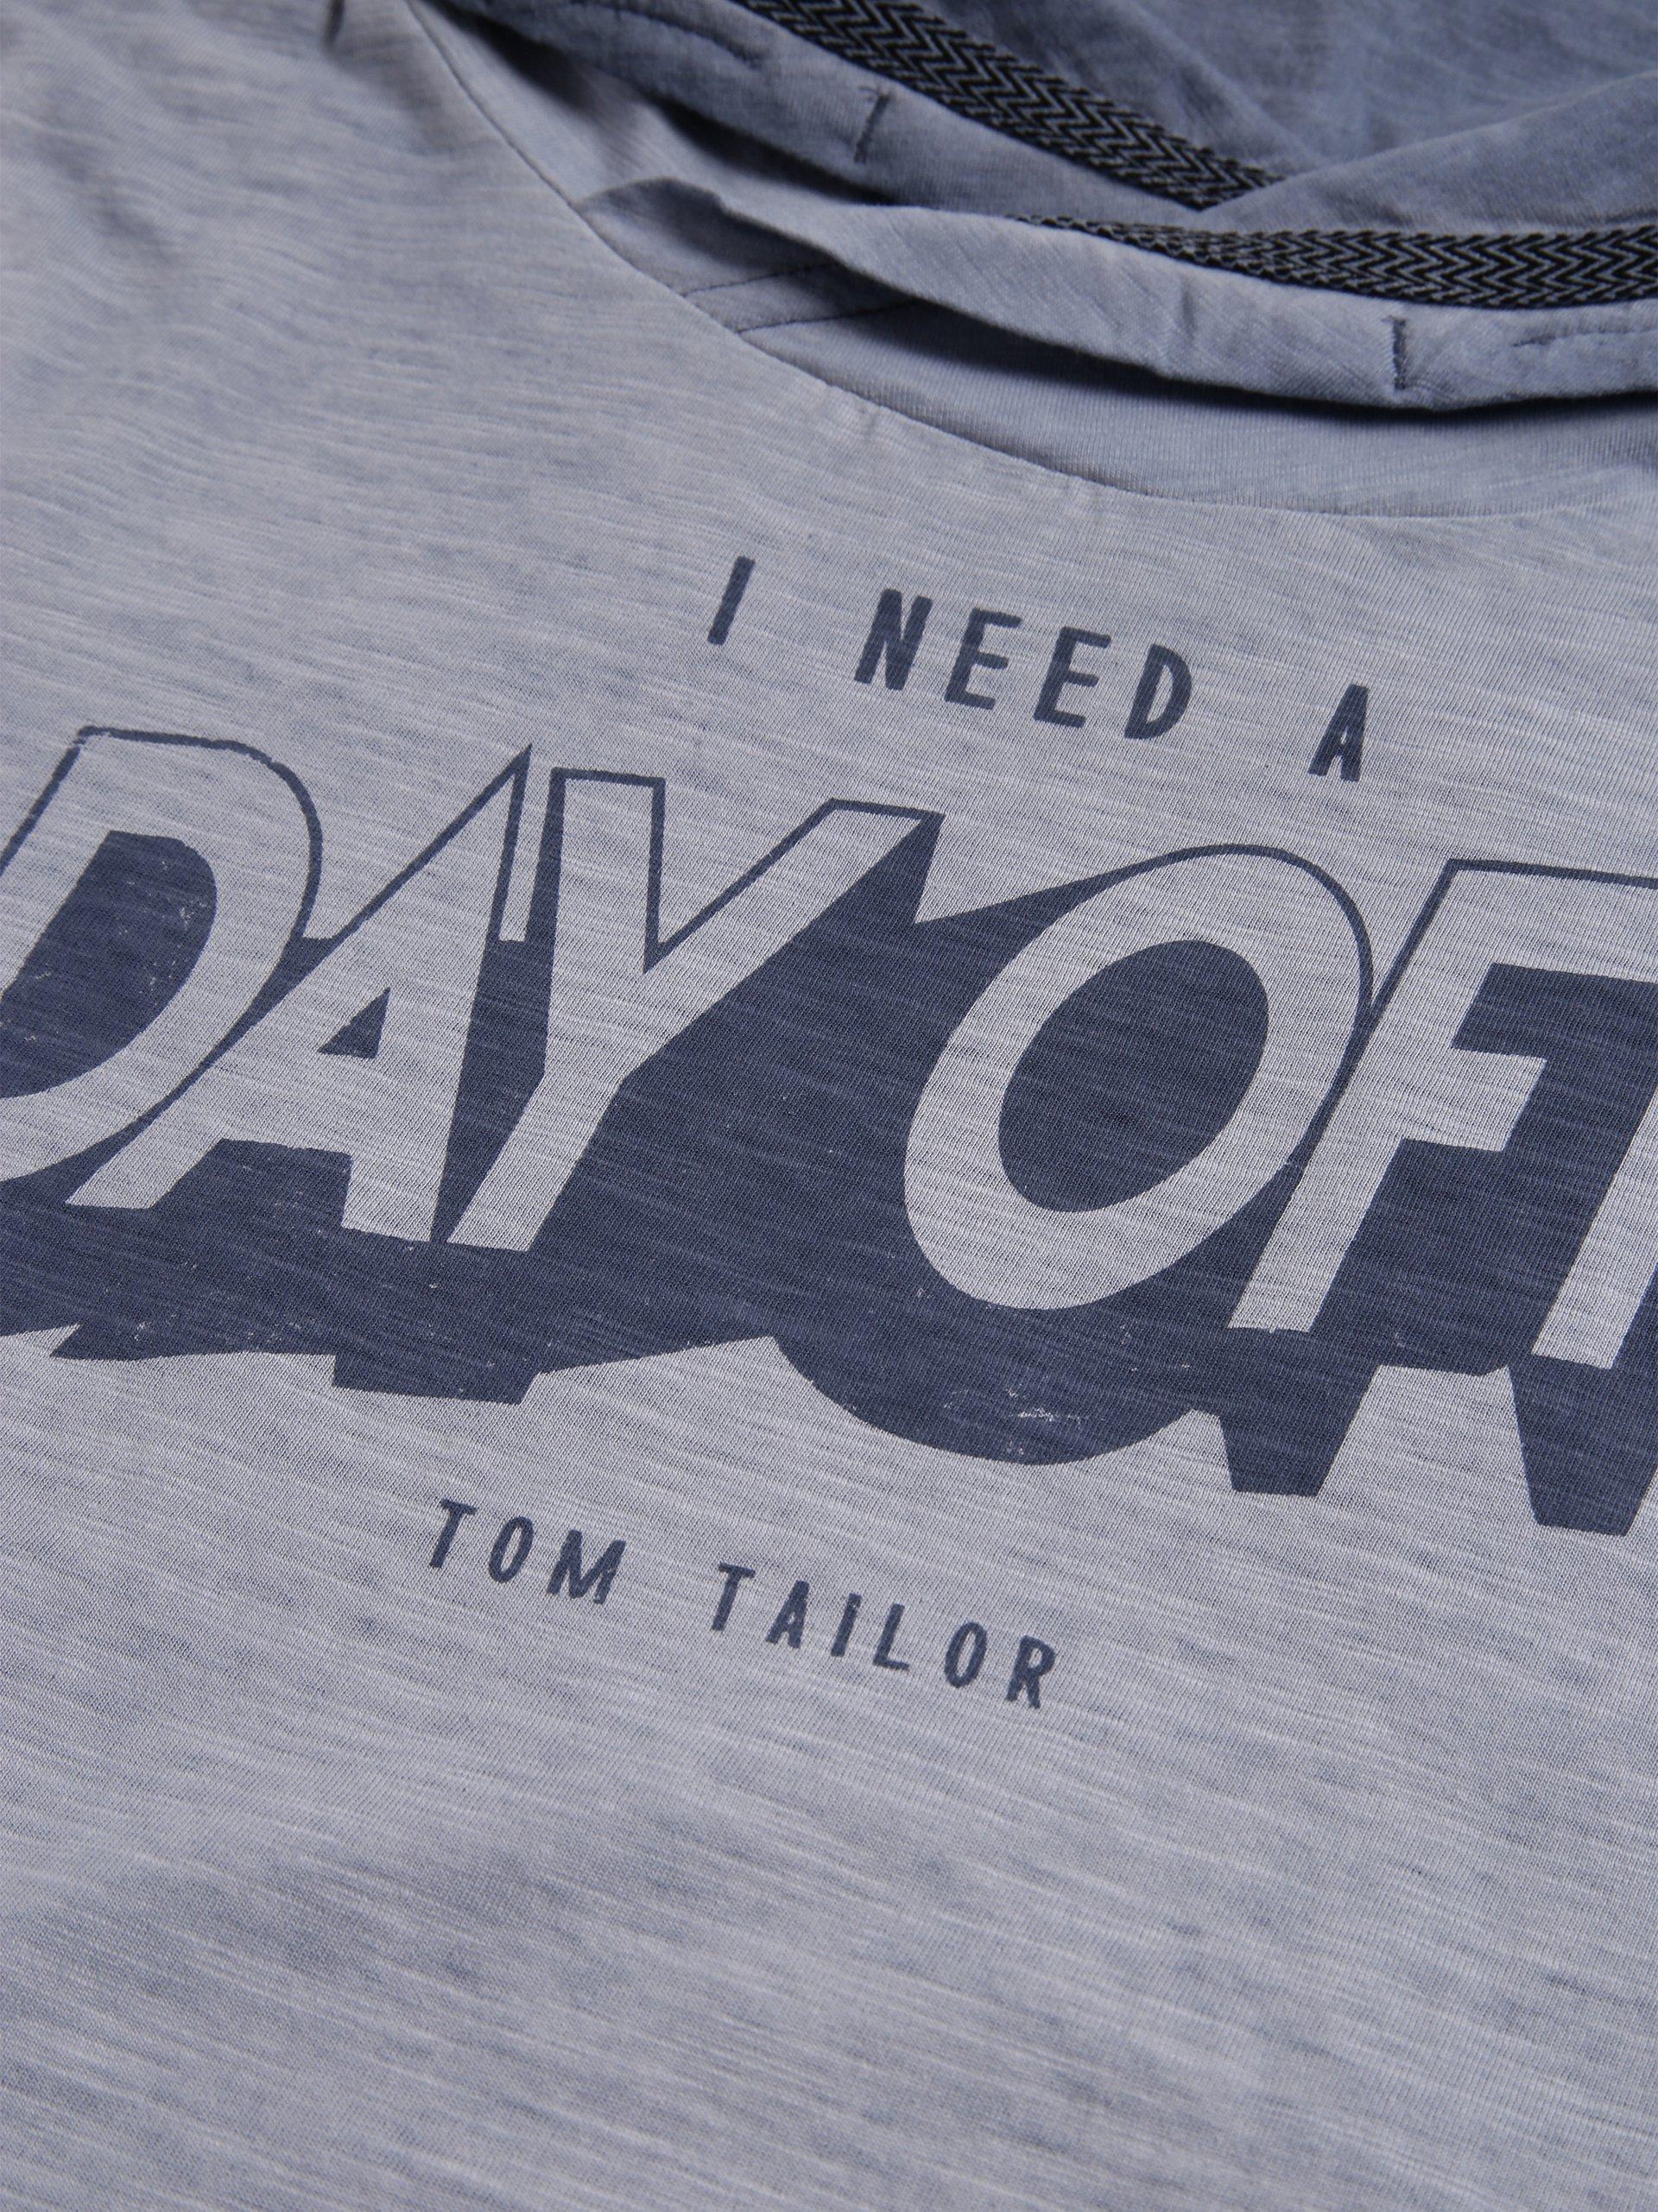 Tom Tailor Jungen Langarmshirt